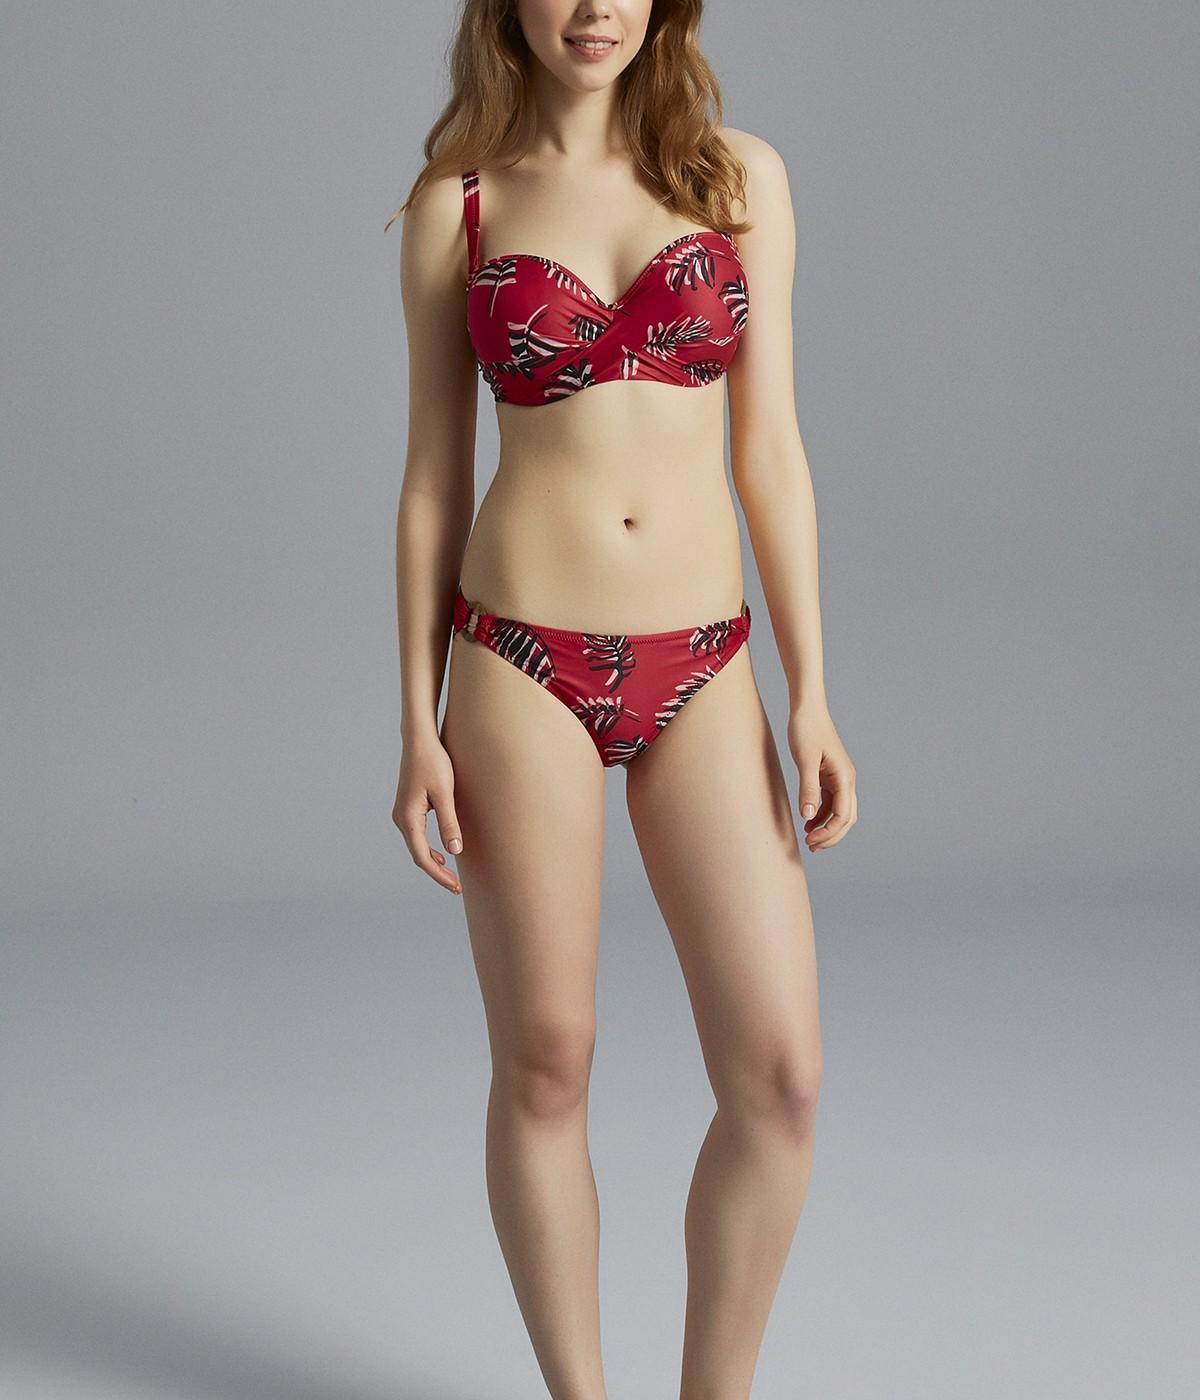 Violet Beauty Form Bikini Top